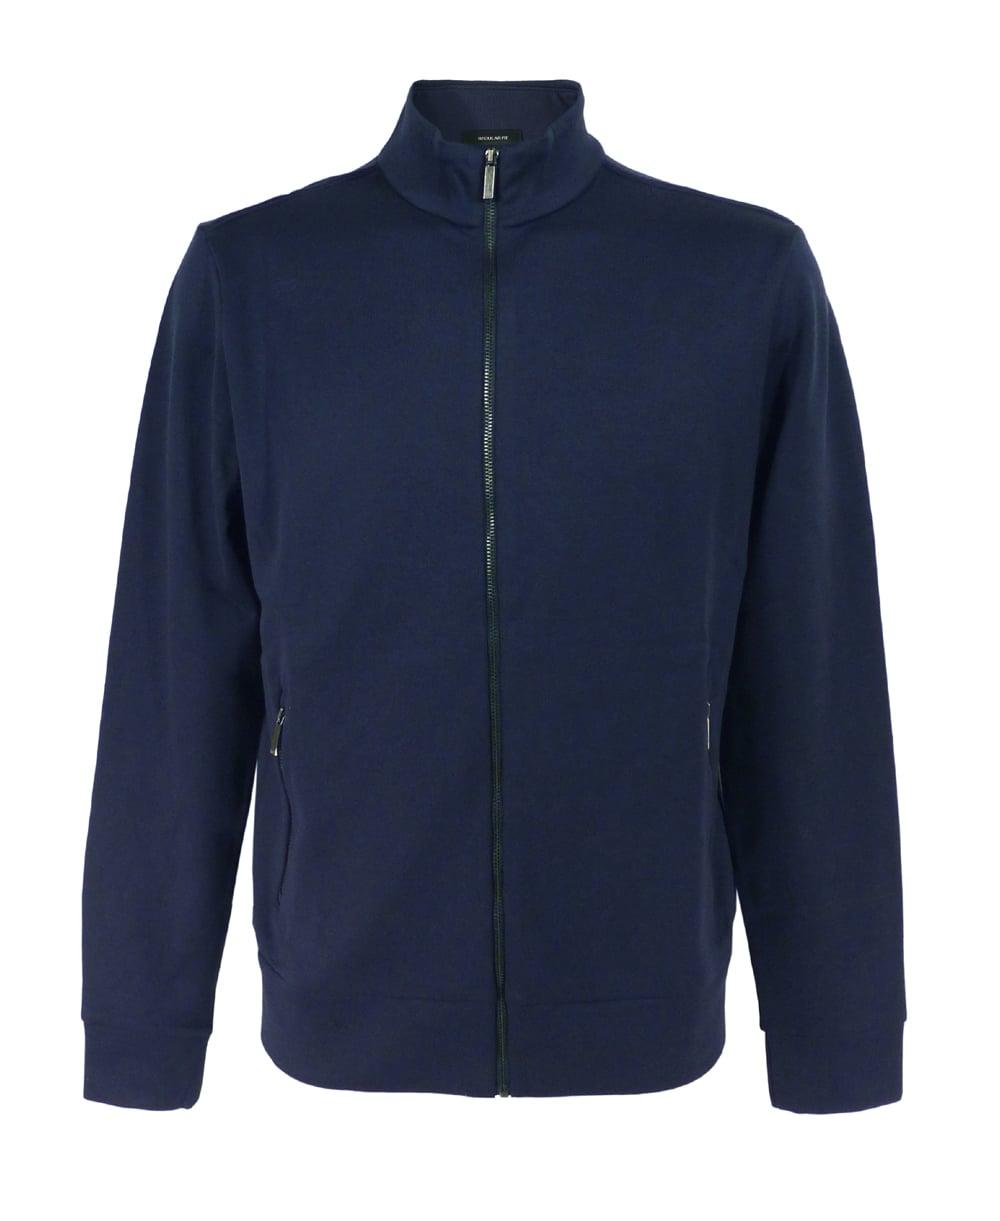 hugo boss 39 sommers 08 39 sweatshirt jacket in dark blue. Black Bedroom Furniture Sets. Home Design Ideas